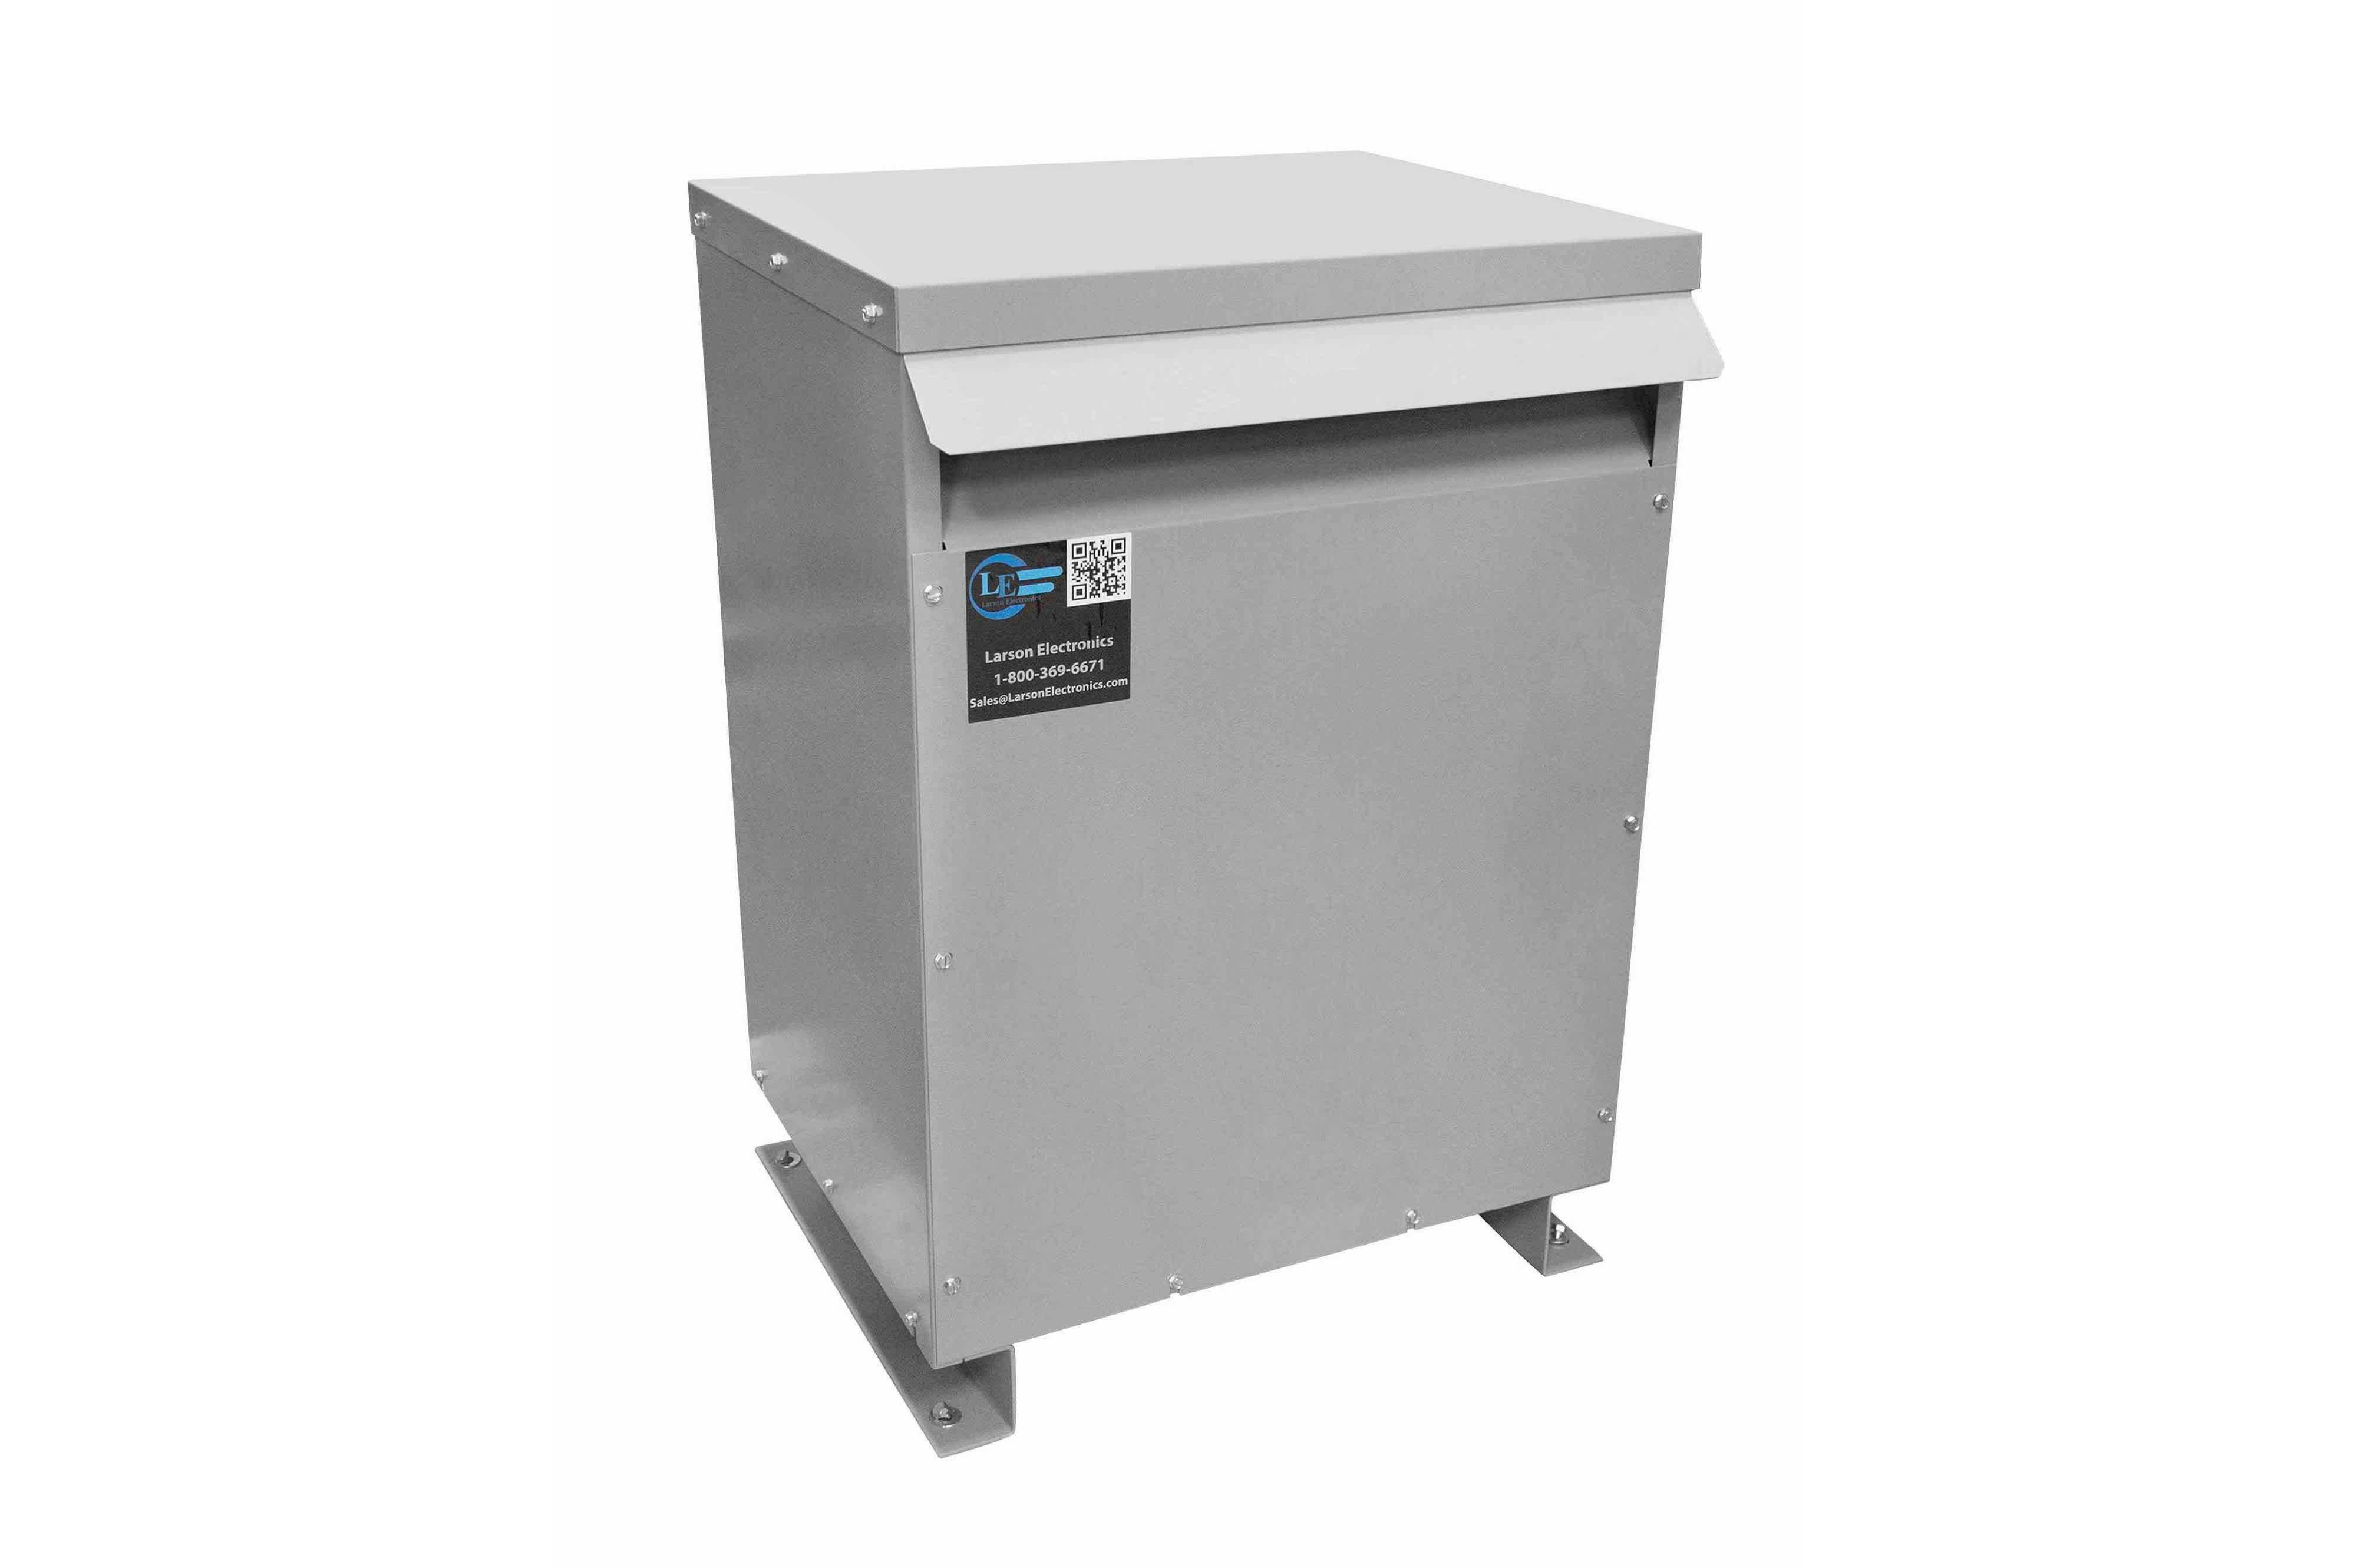 15 kVA 3PH Isolation Transformer, 600V Wye Primary, 400V Delta Secondary, N3R, Ventilated, 60 Hz